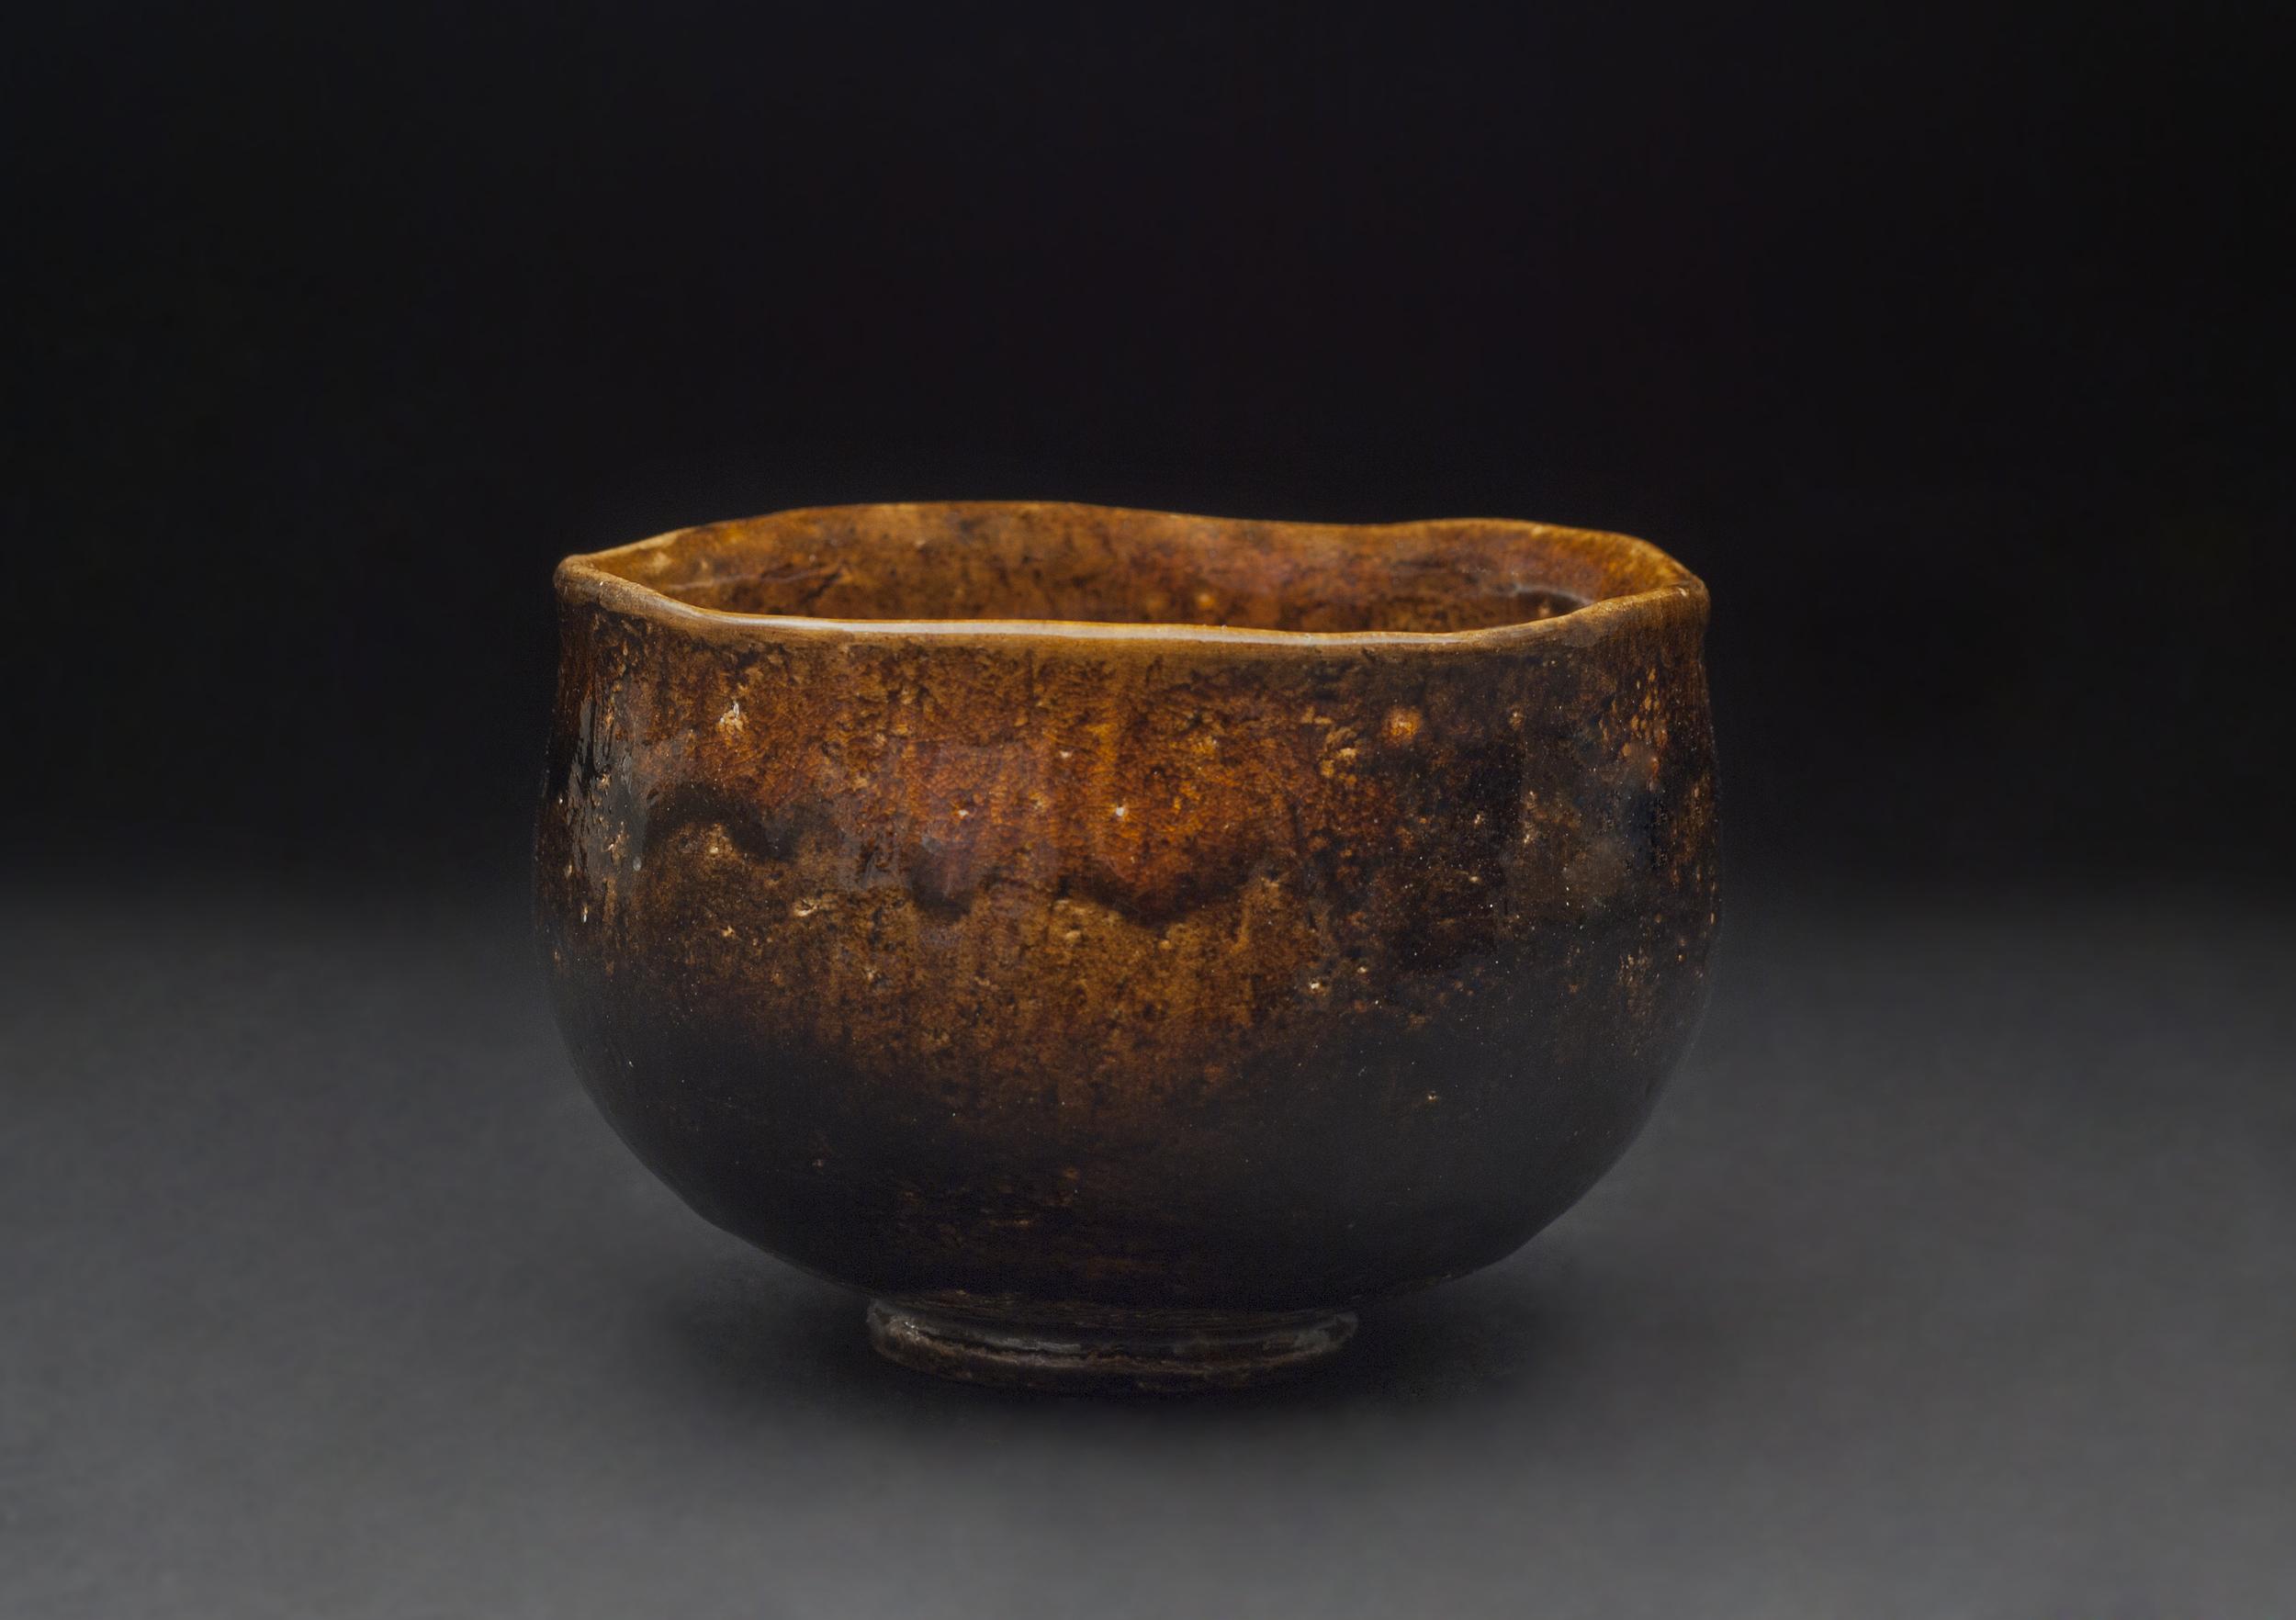 Toshio Ohi    Ohi Amber Raku Tea Bowl  , 2011 Ceramic 3.25 x 4.75 inches / 8.3 x 12.1 cm / TOh 2